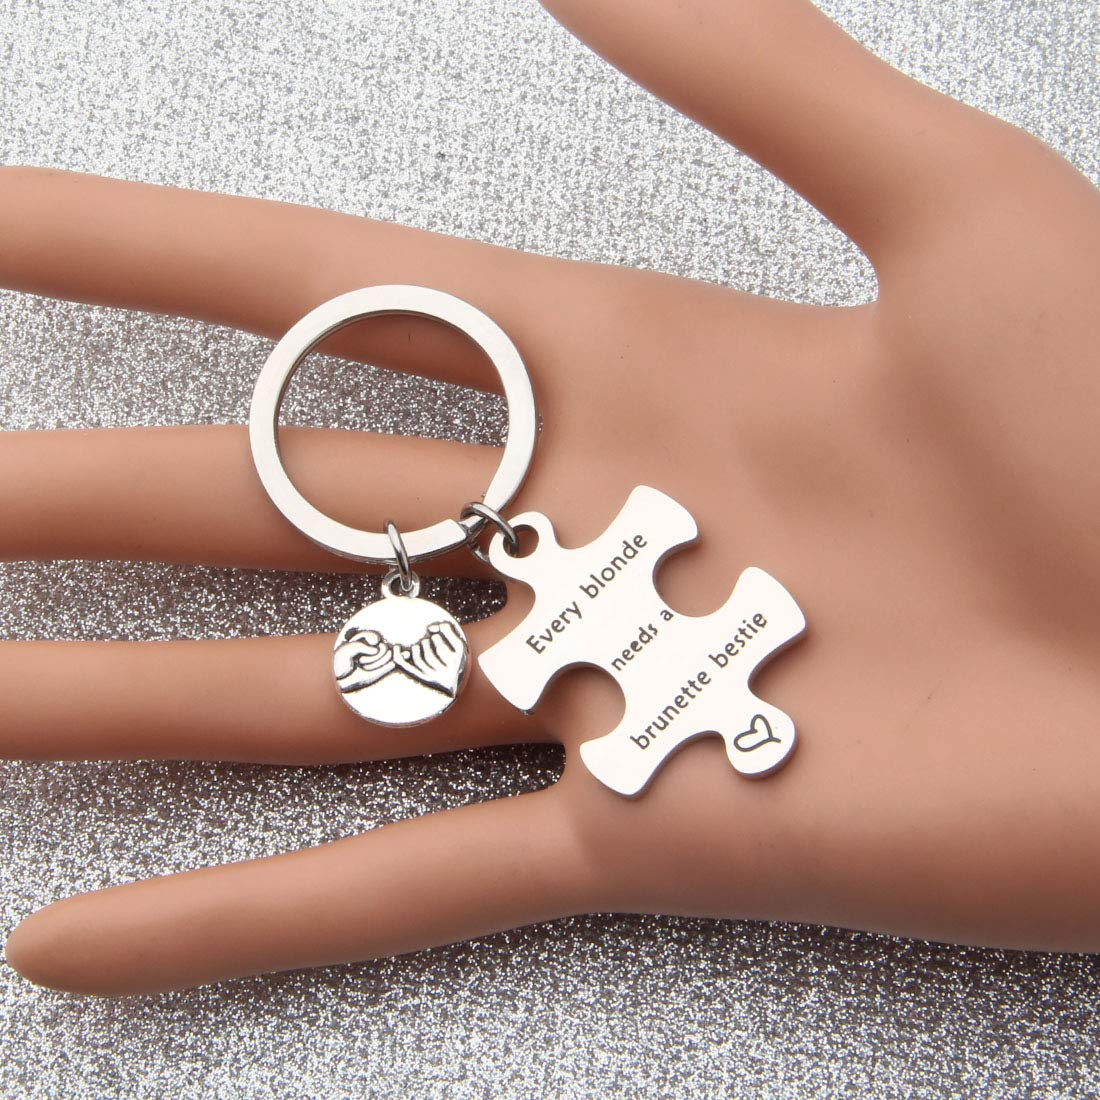 bobauna Every Blonde//Brunette Needs A Brunette//Blonde Bestie Pinky Promise Puzzle Keychain Set